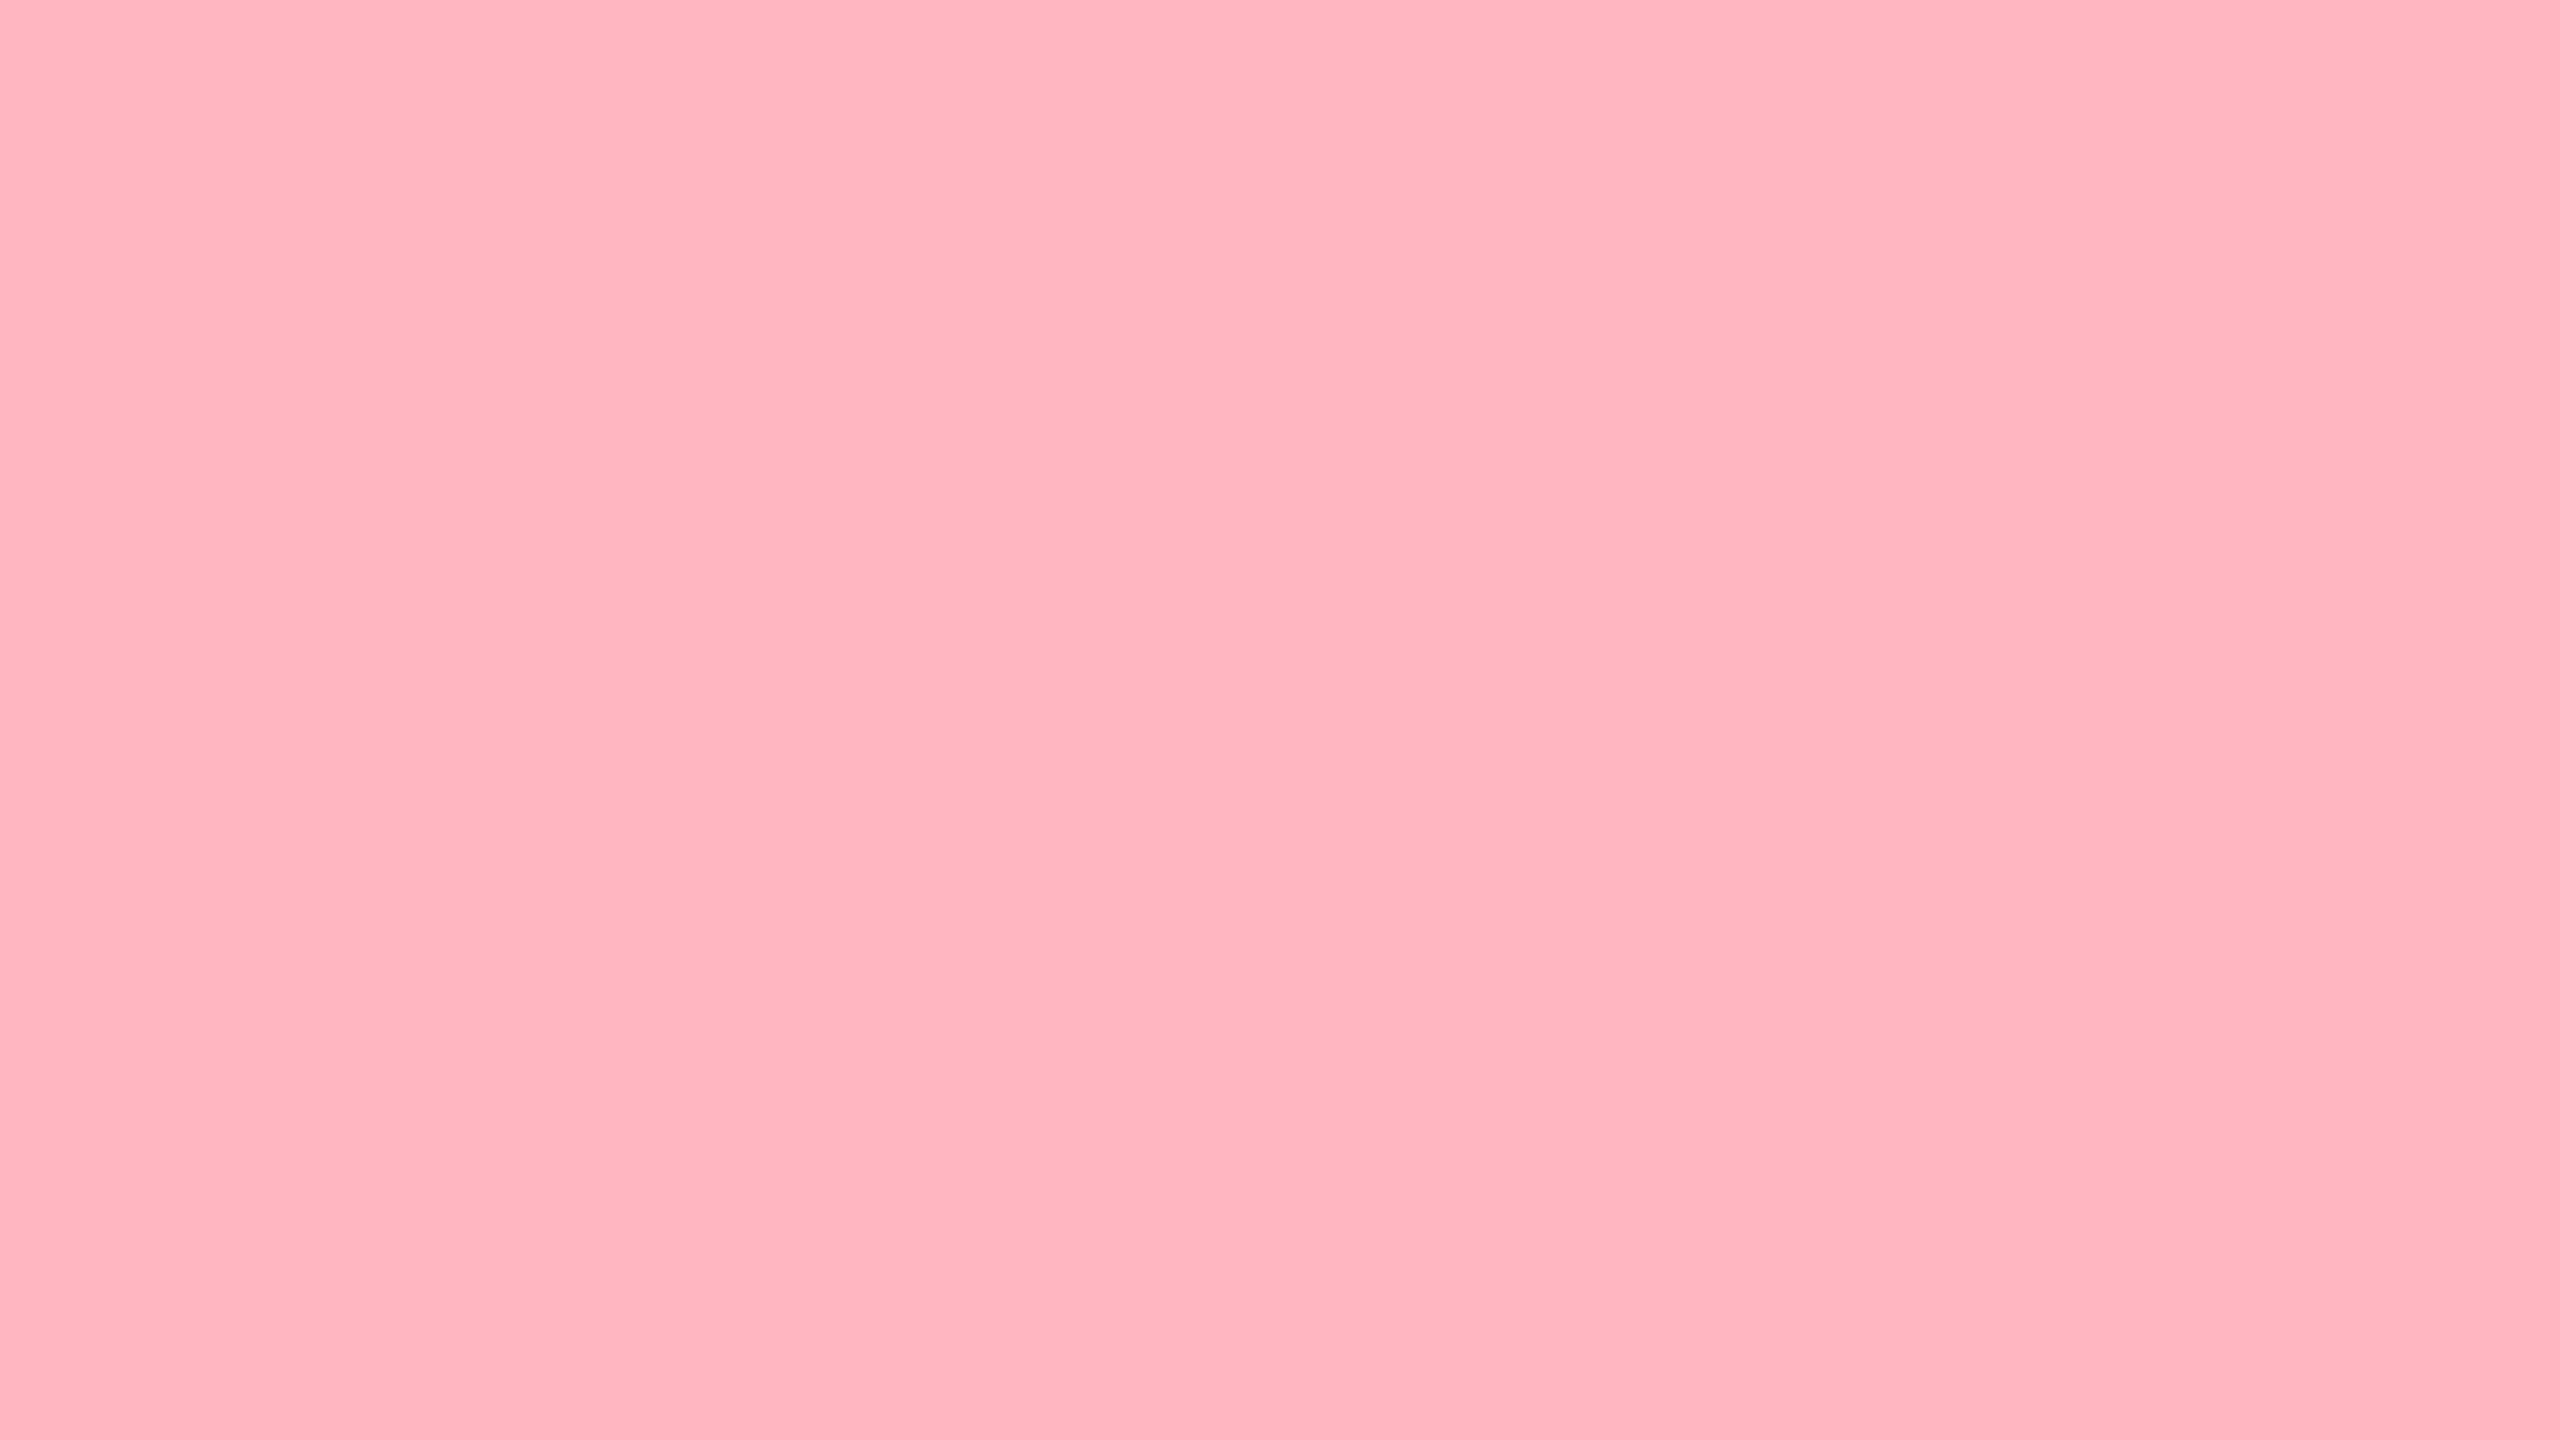 Light Pink Backgrounds Wallpapersafari